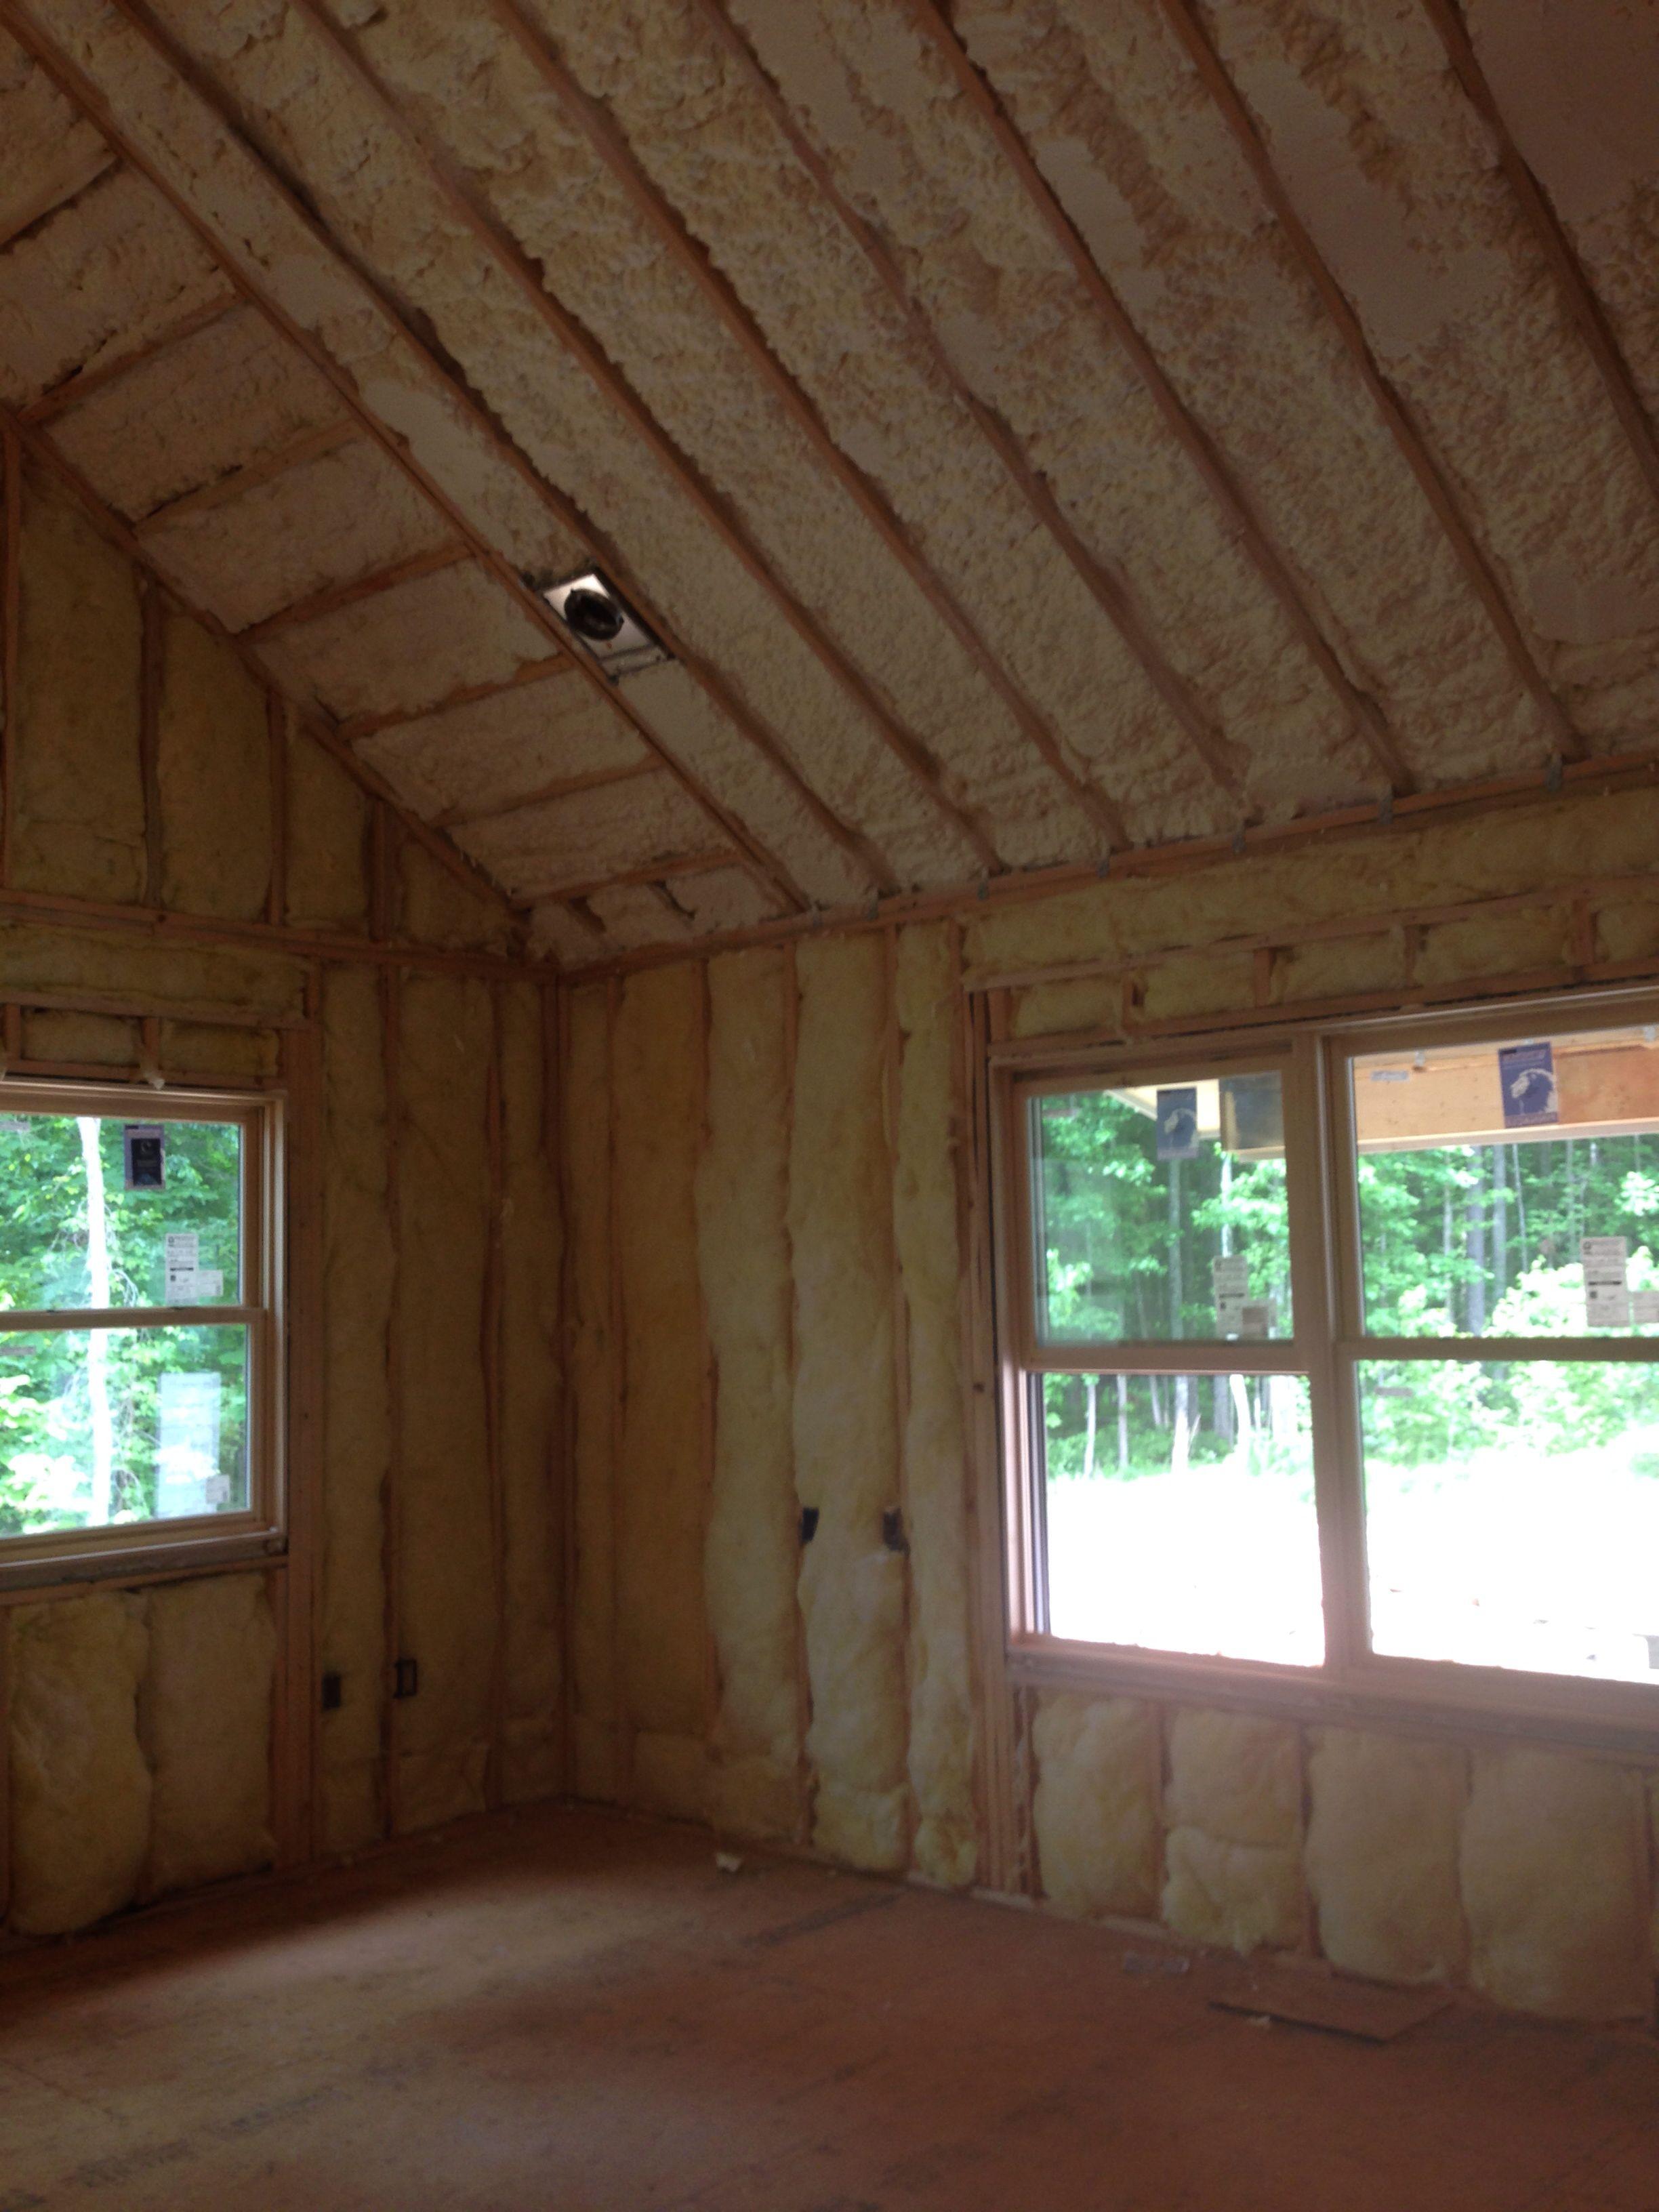 Hybrid Solution Fiberglass On The Exterior Walls And Spray Foam